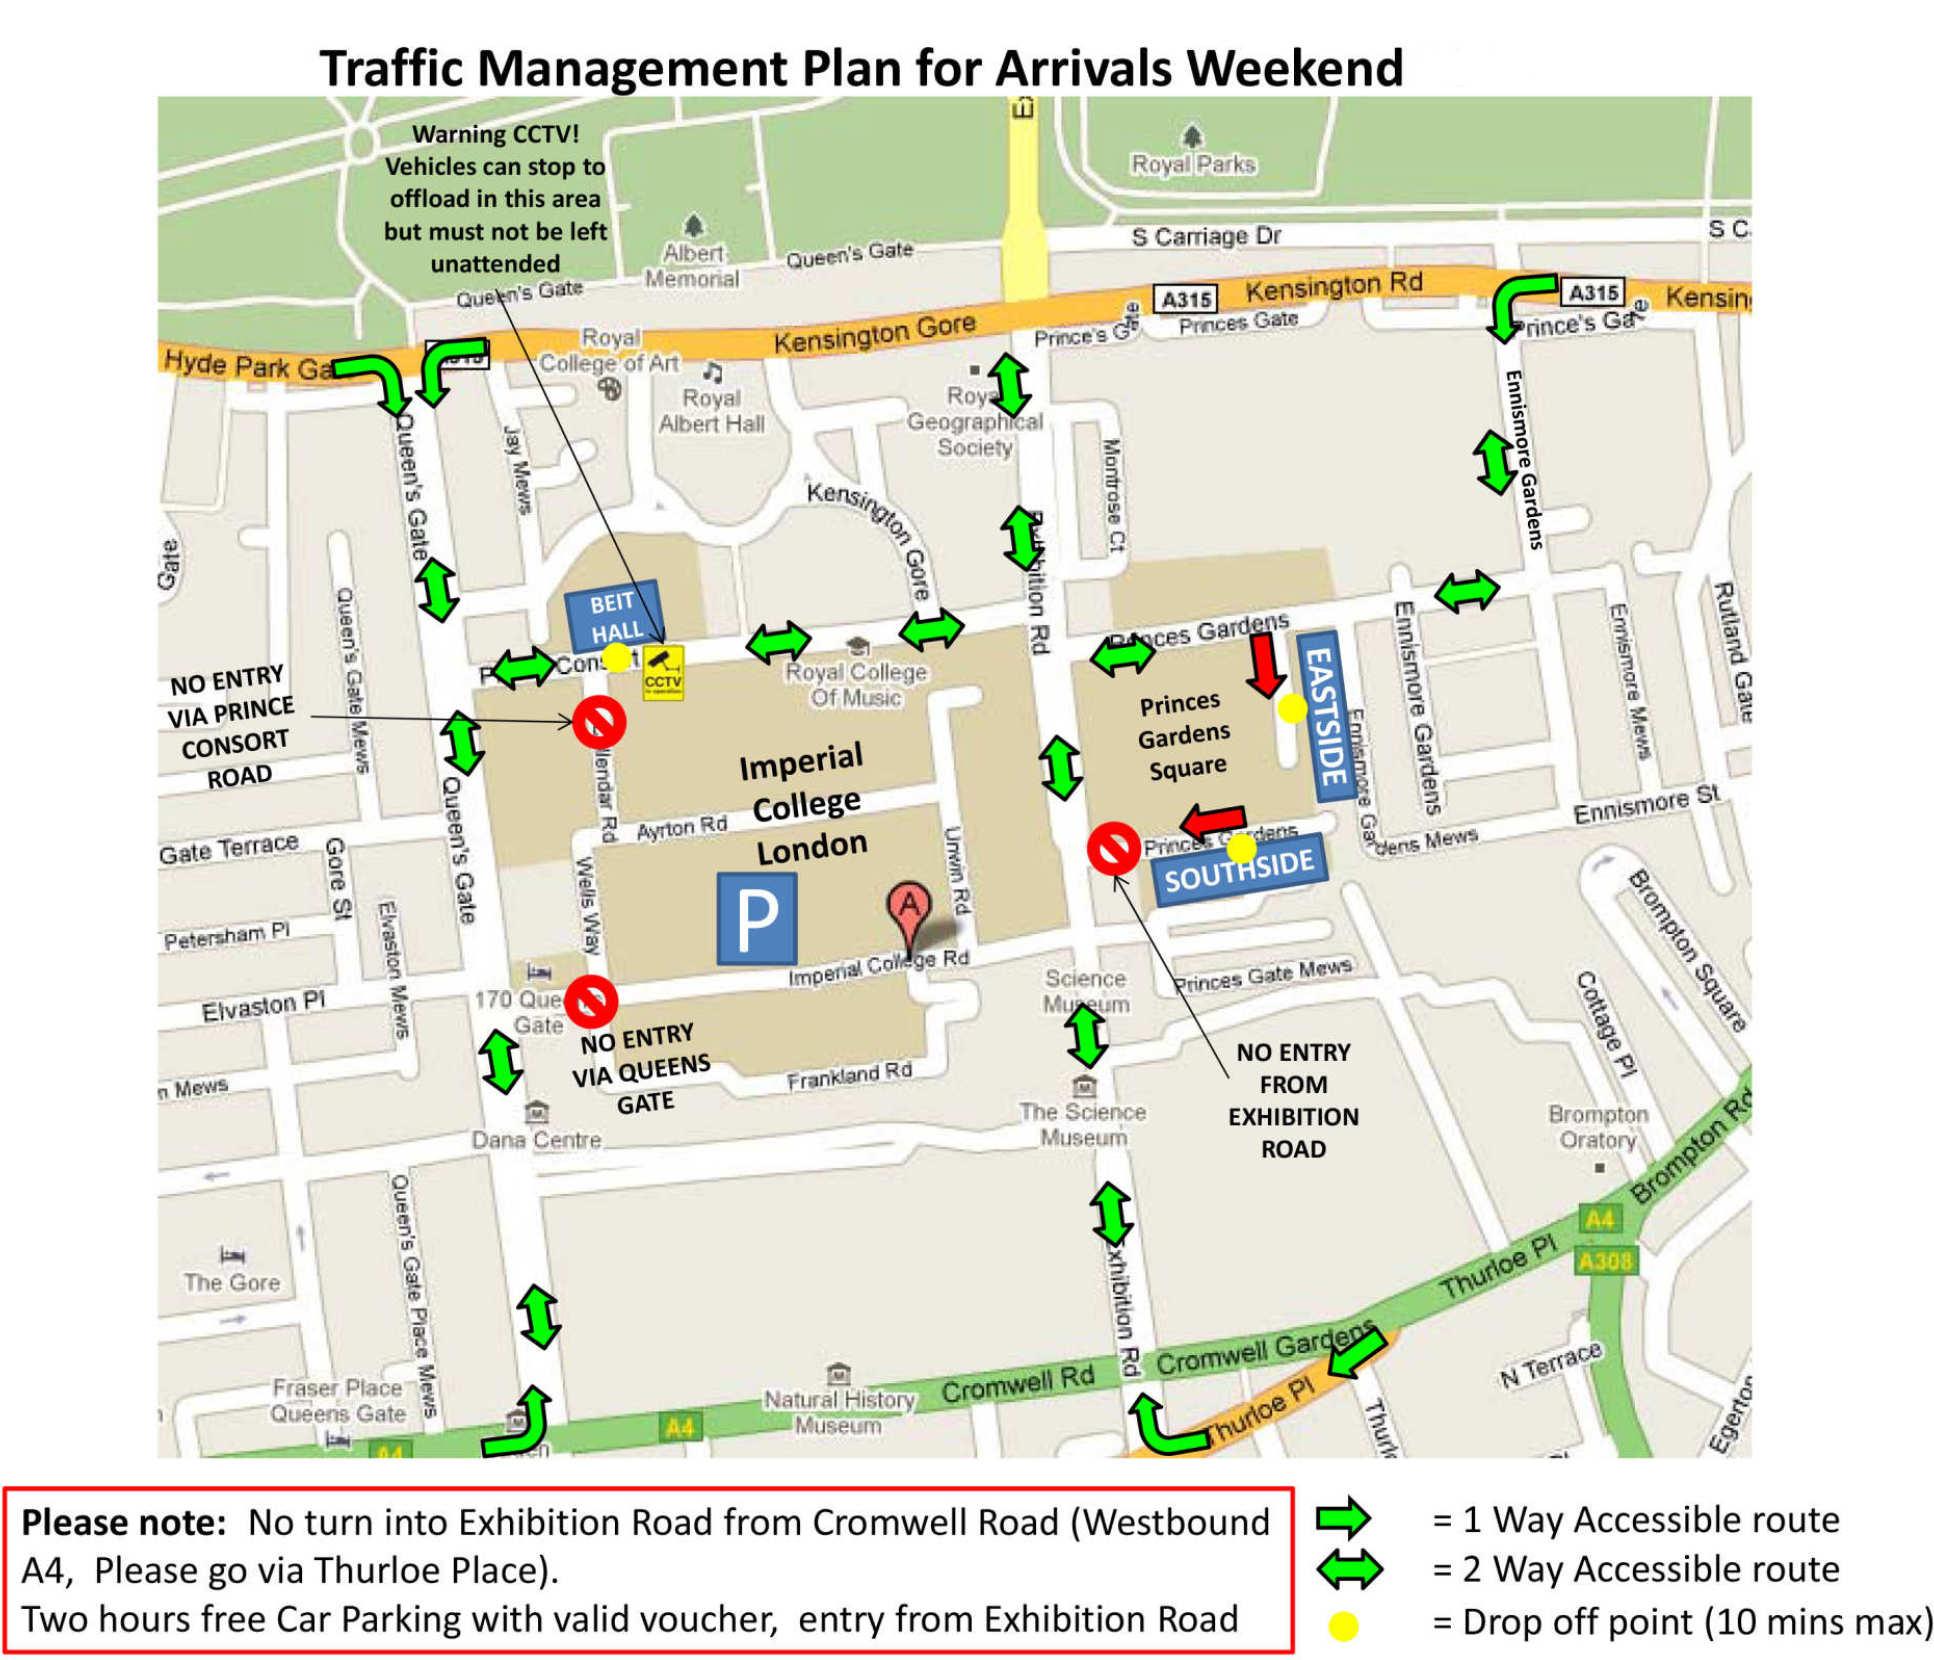 South Kensington Map South Kensington traffic management | Study | Imperial College London South Kensington Map